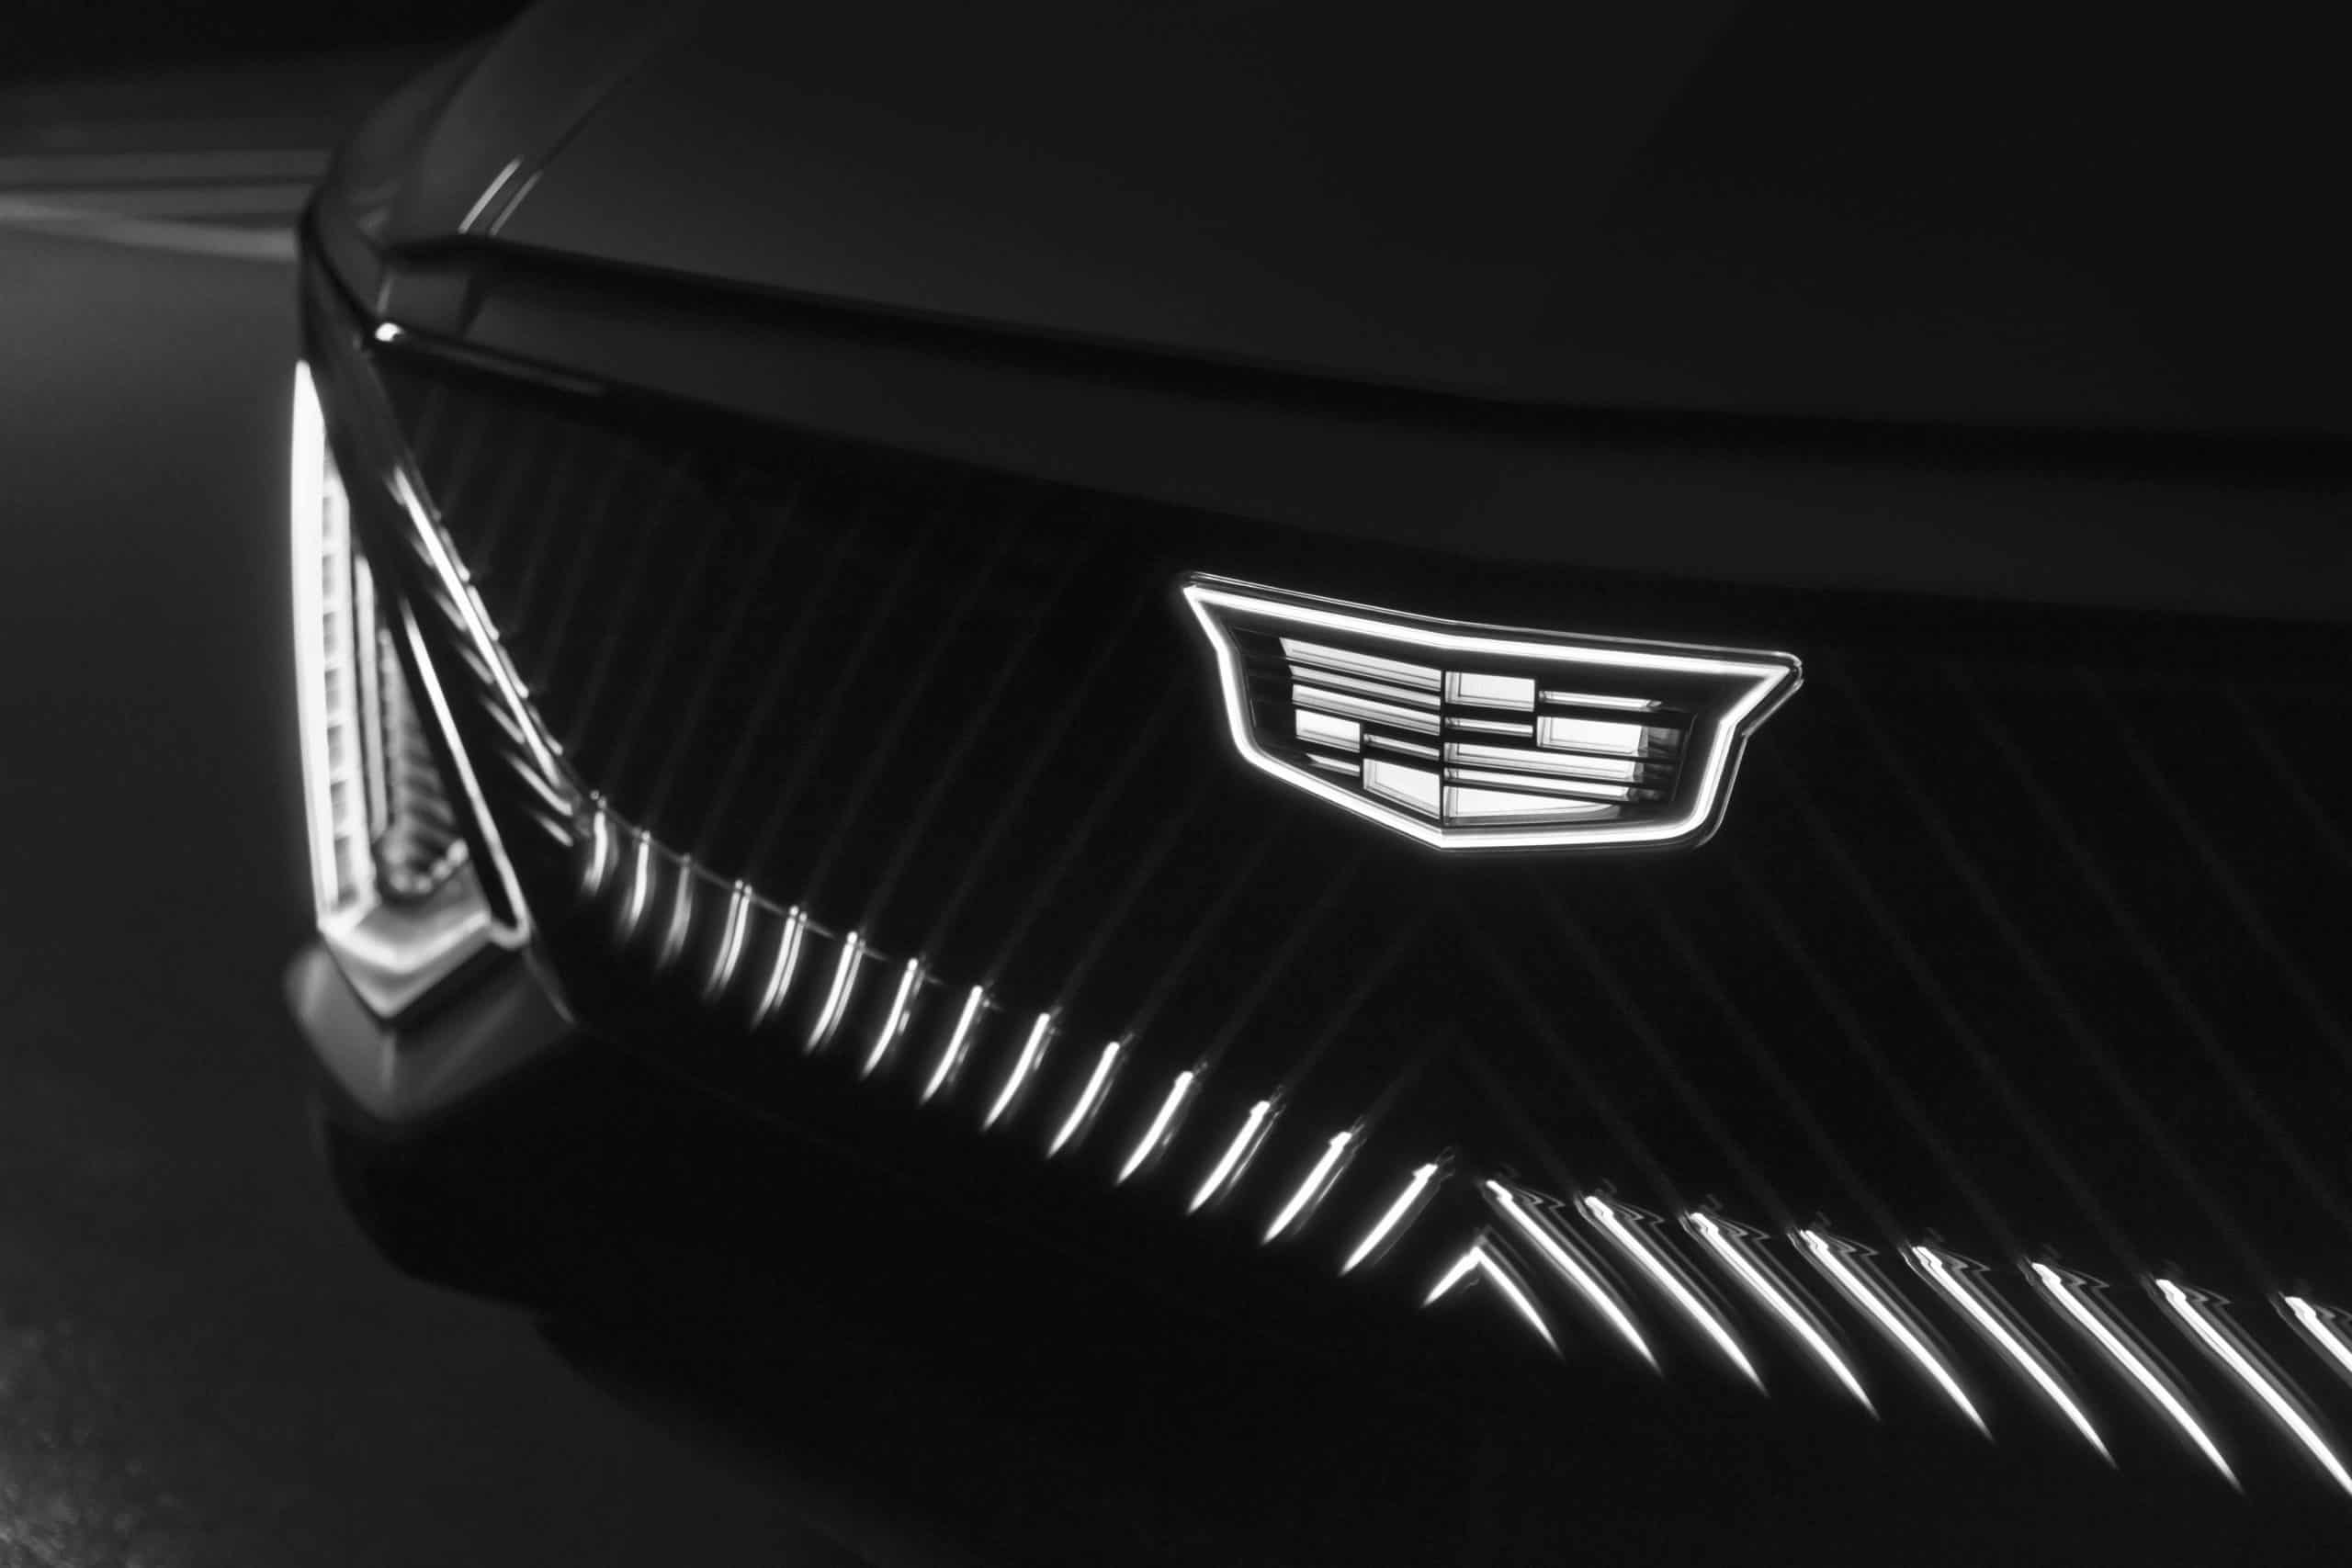 Cadillac LYRIQ grille lights